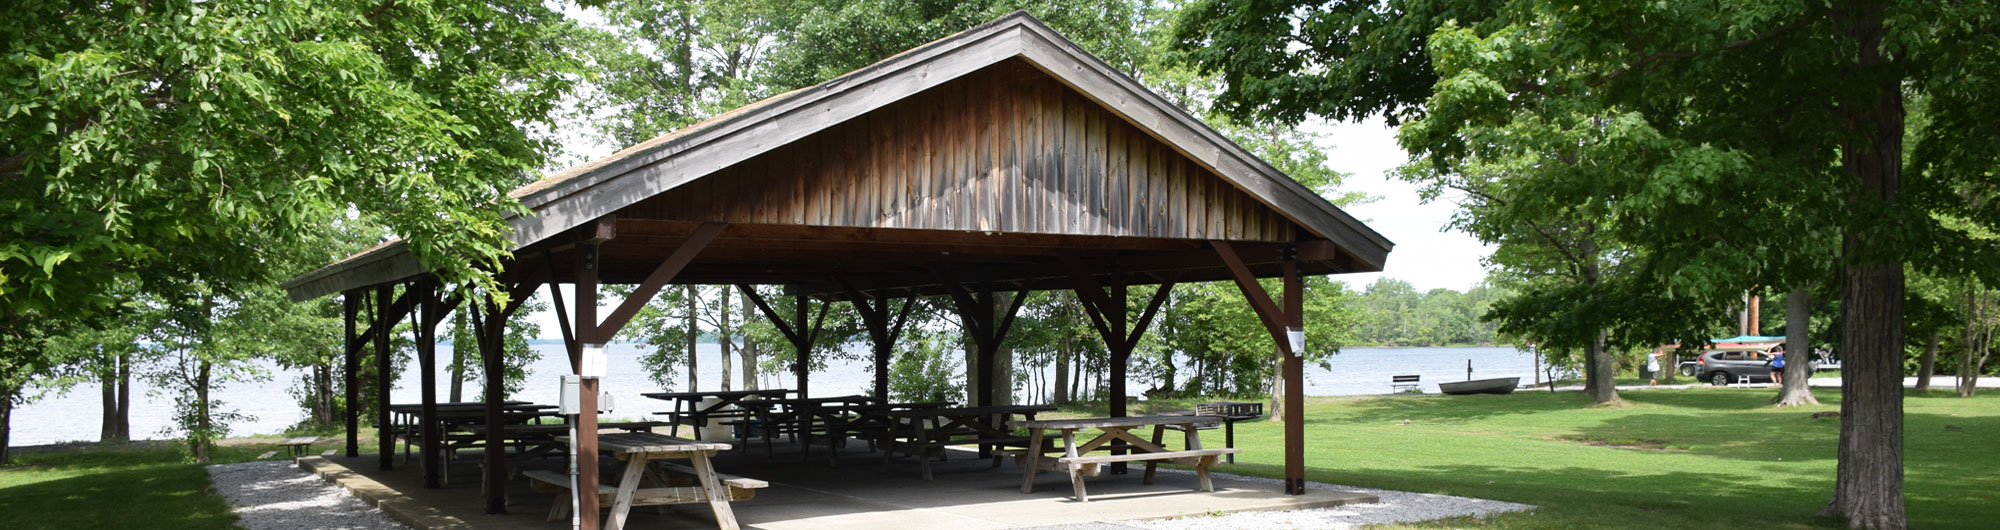 Vermont State Parks - Kamp Kill Kare